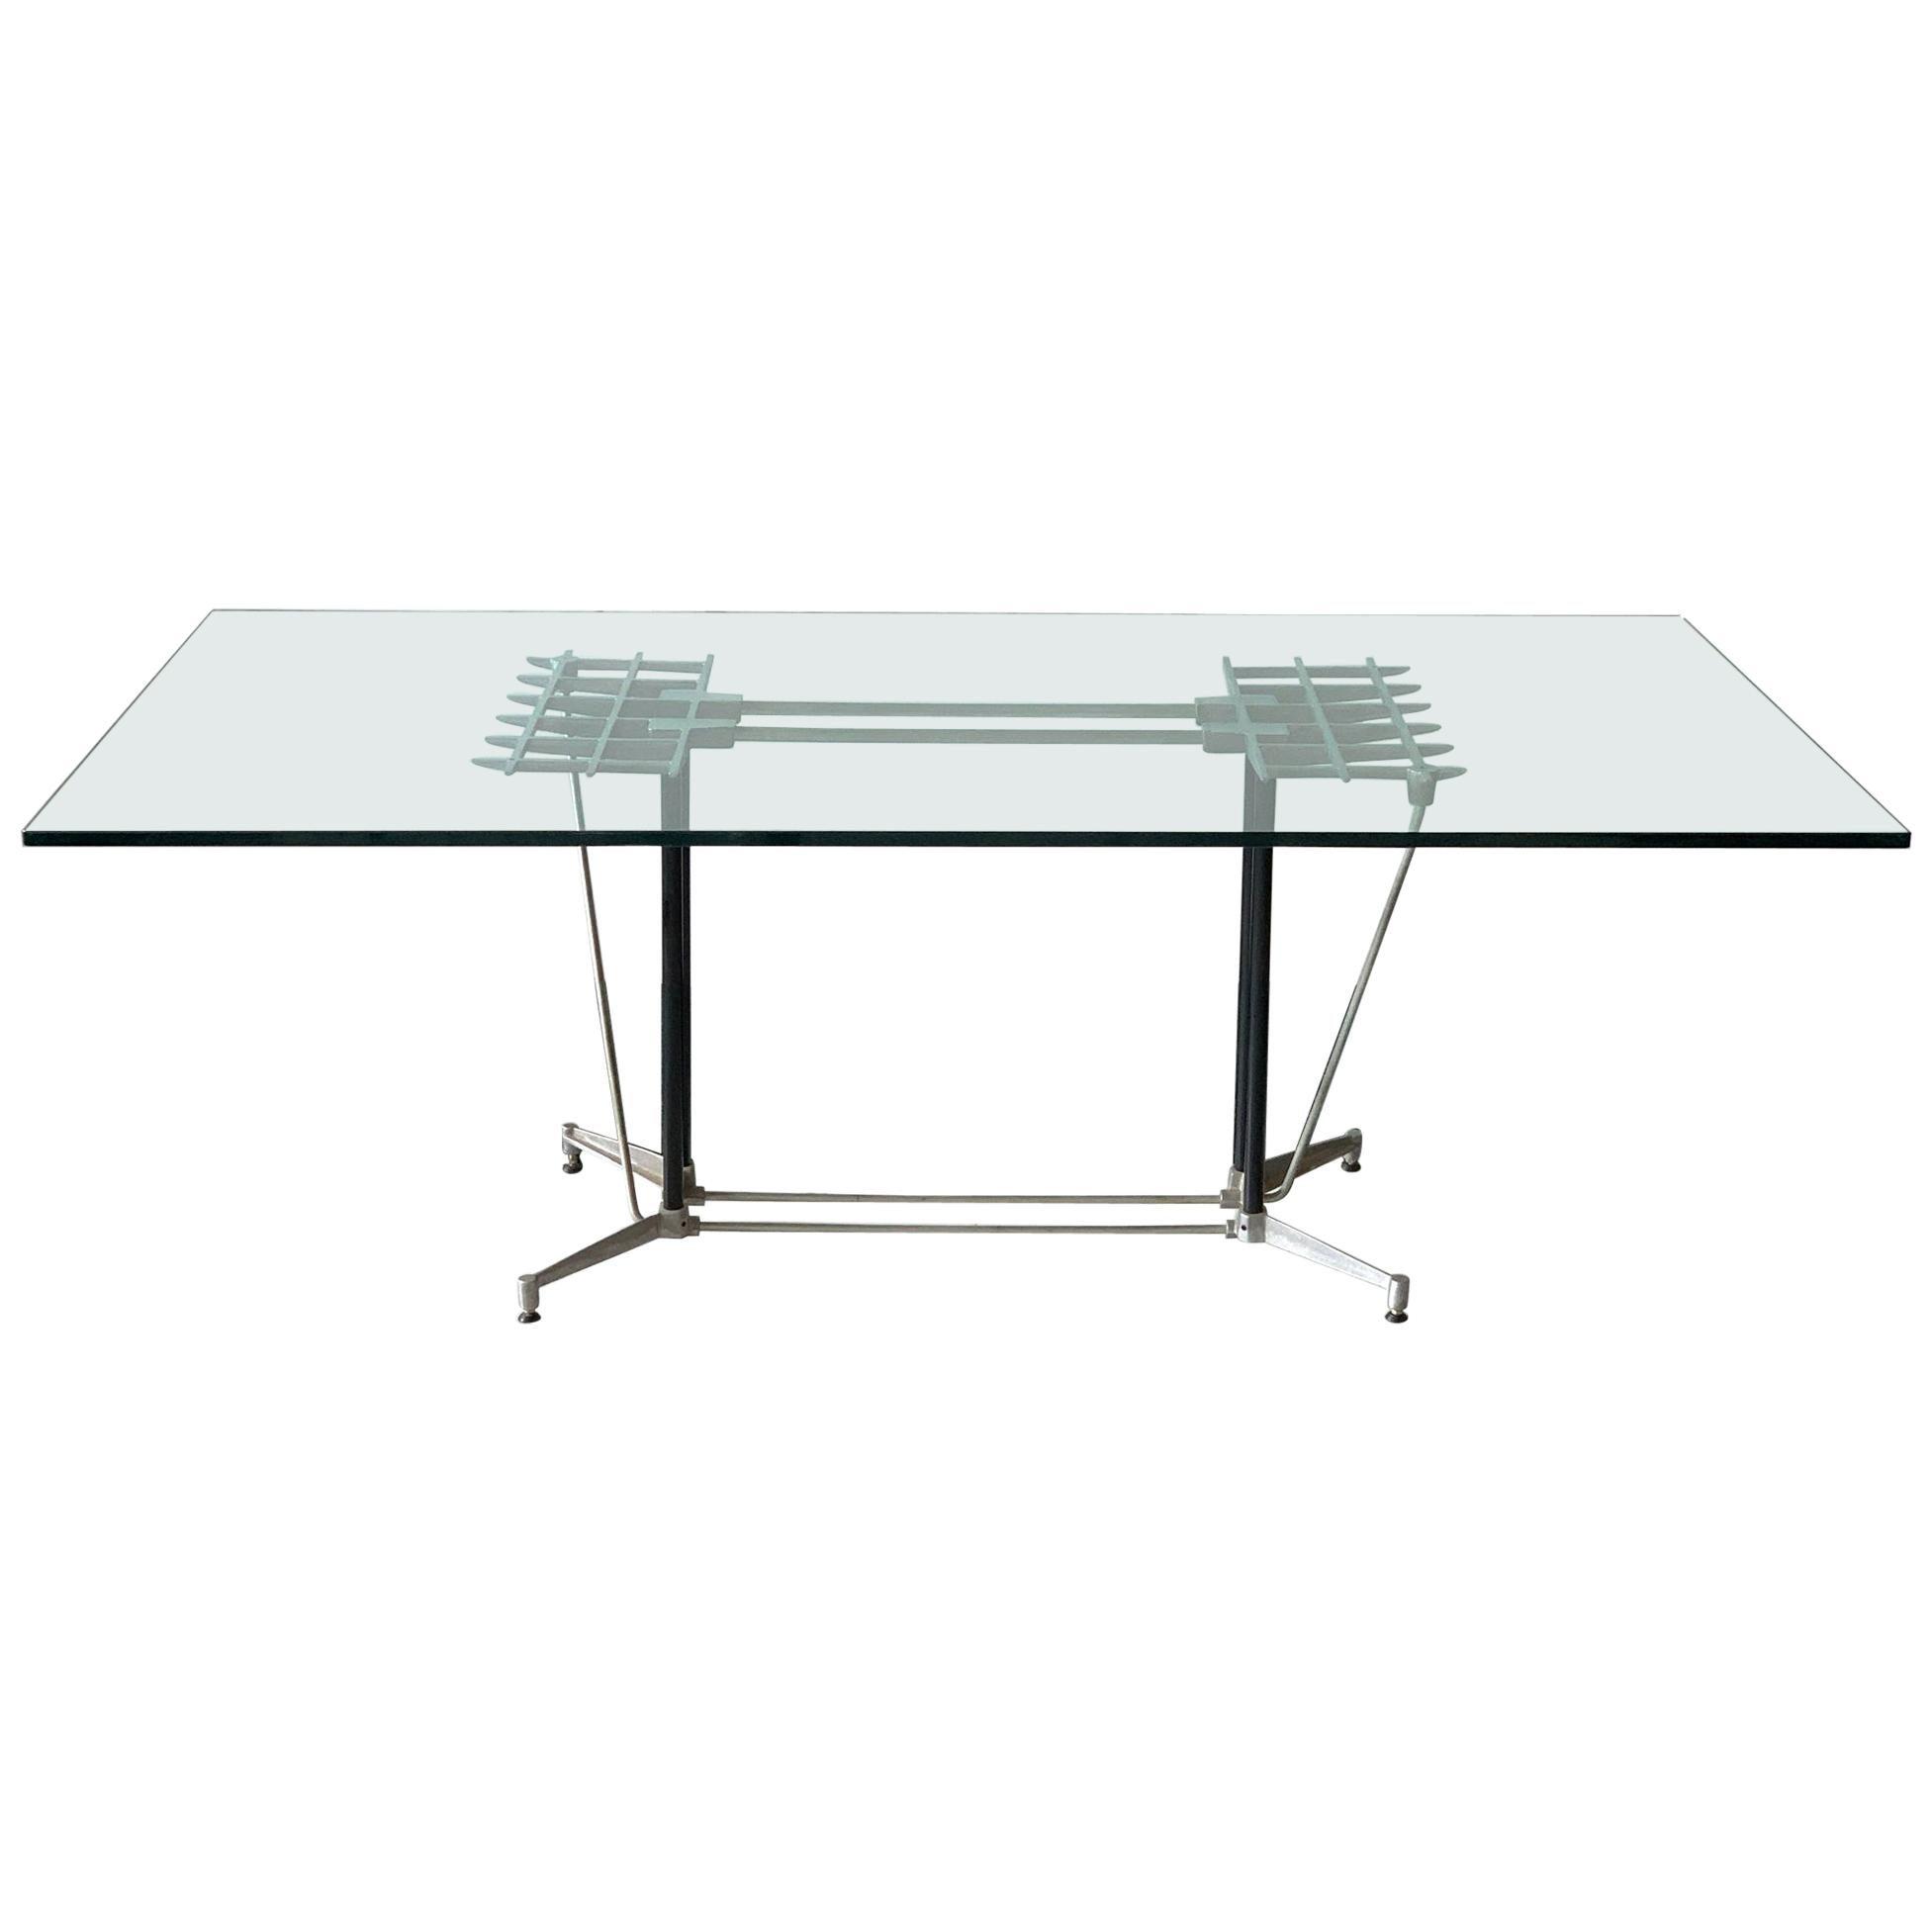 Postmodern Industrial Dining Table Designed by Robert Josten